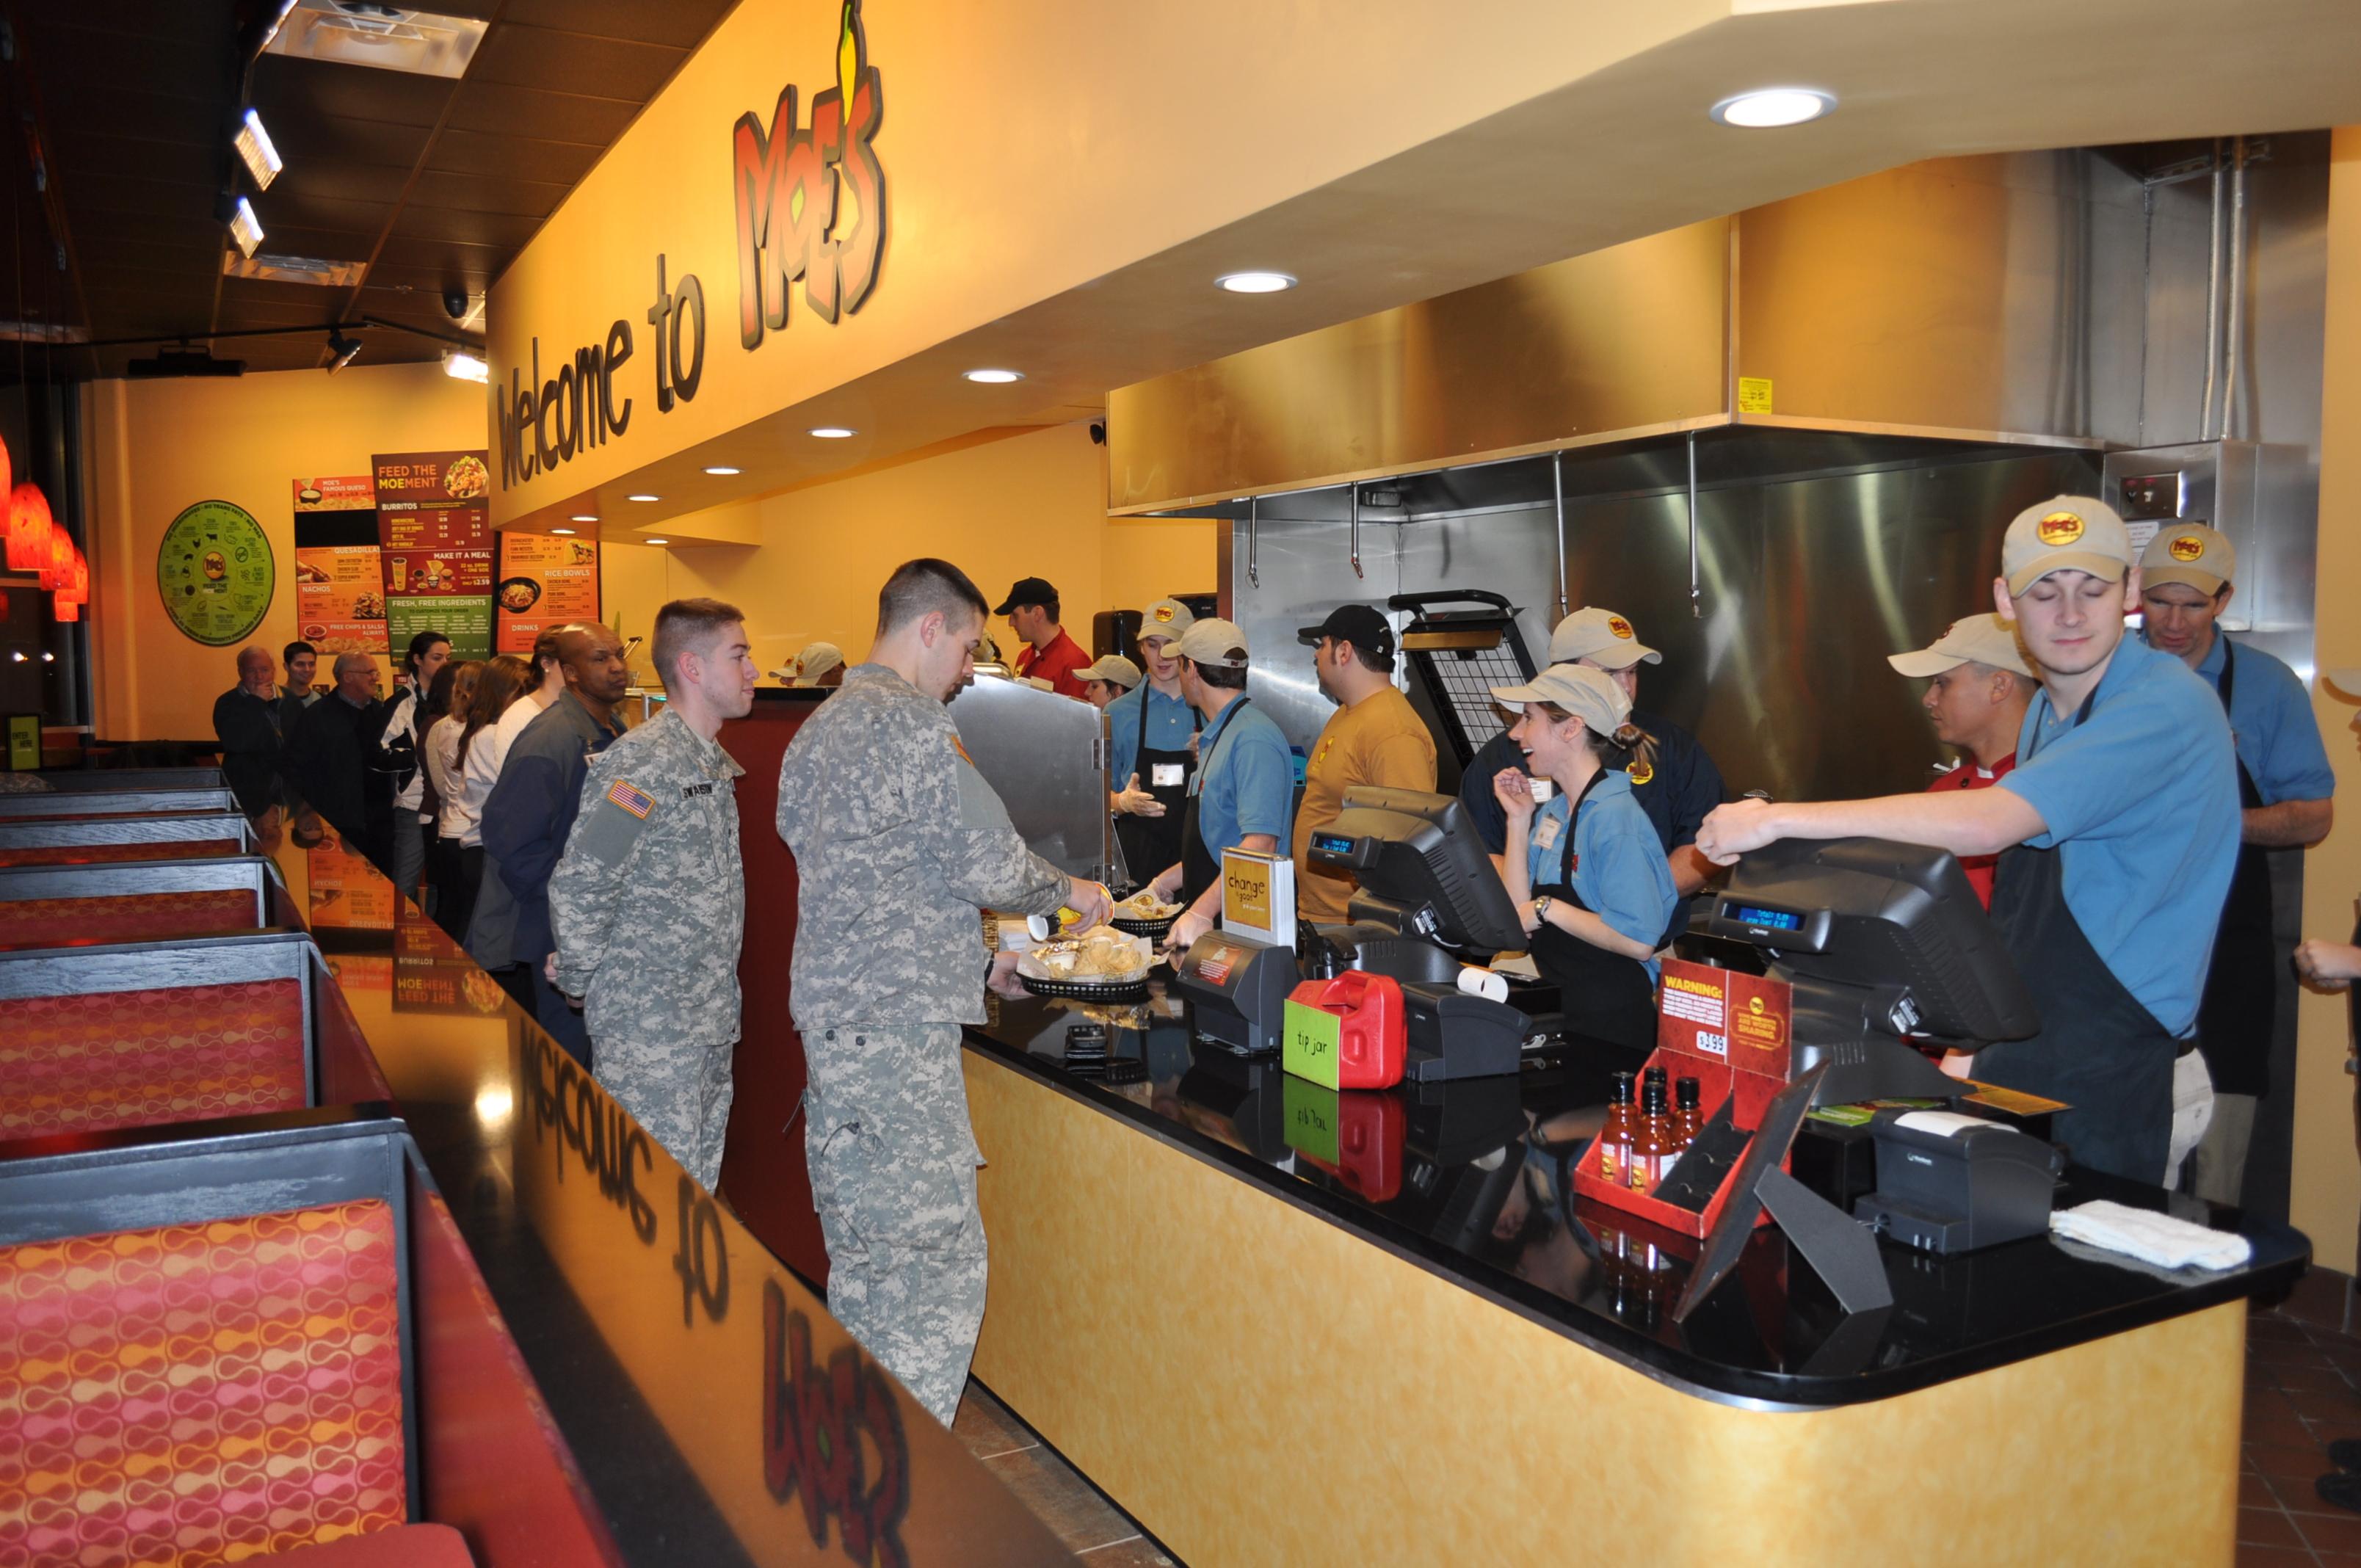 Moe s southwest grill opens in tuscaloosa al moe 39 s for Food bar tuscaloosa